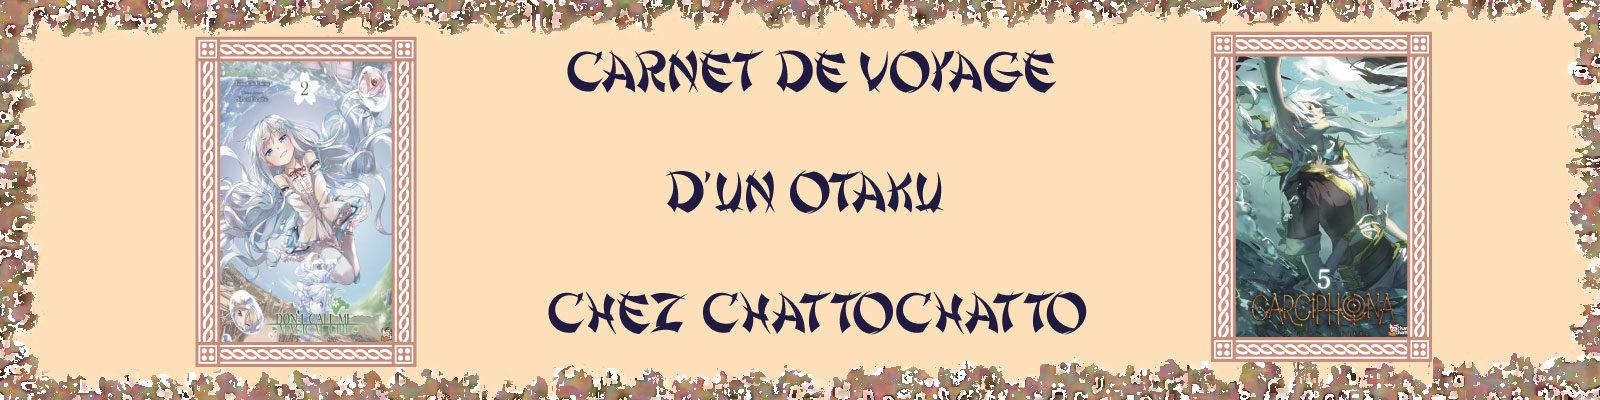 CARNET-DE-VOYAGE-OTAKU-chattochatto